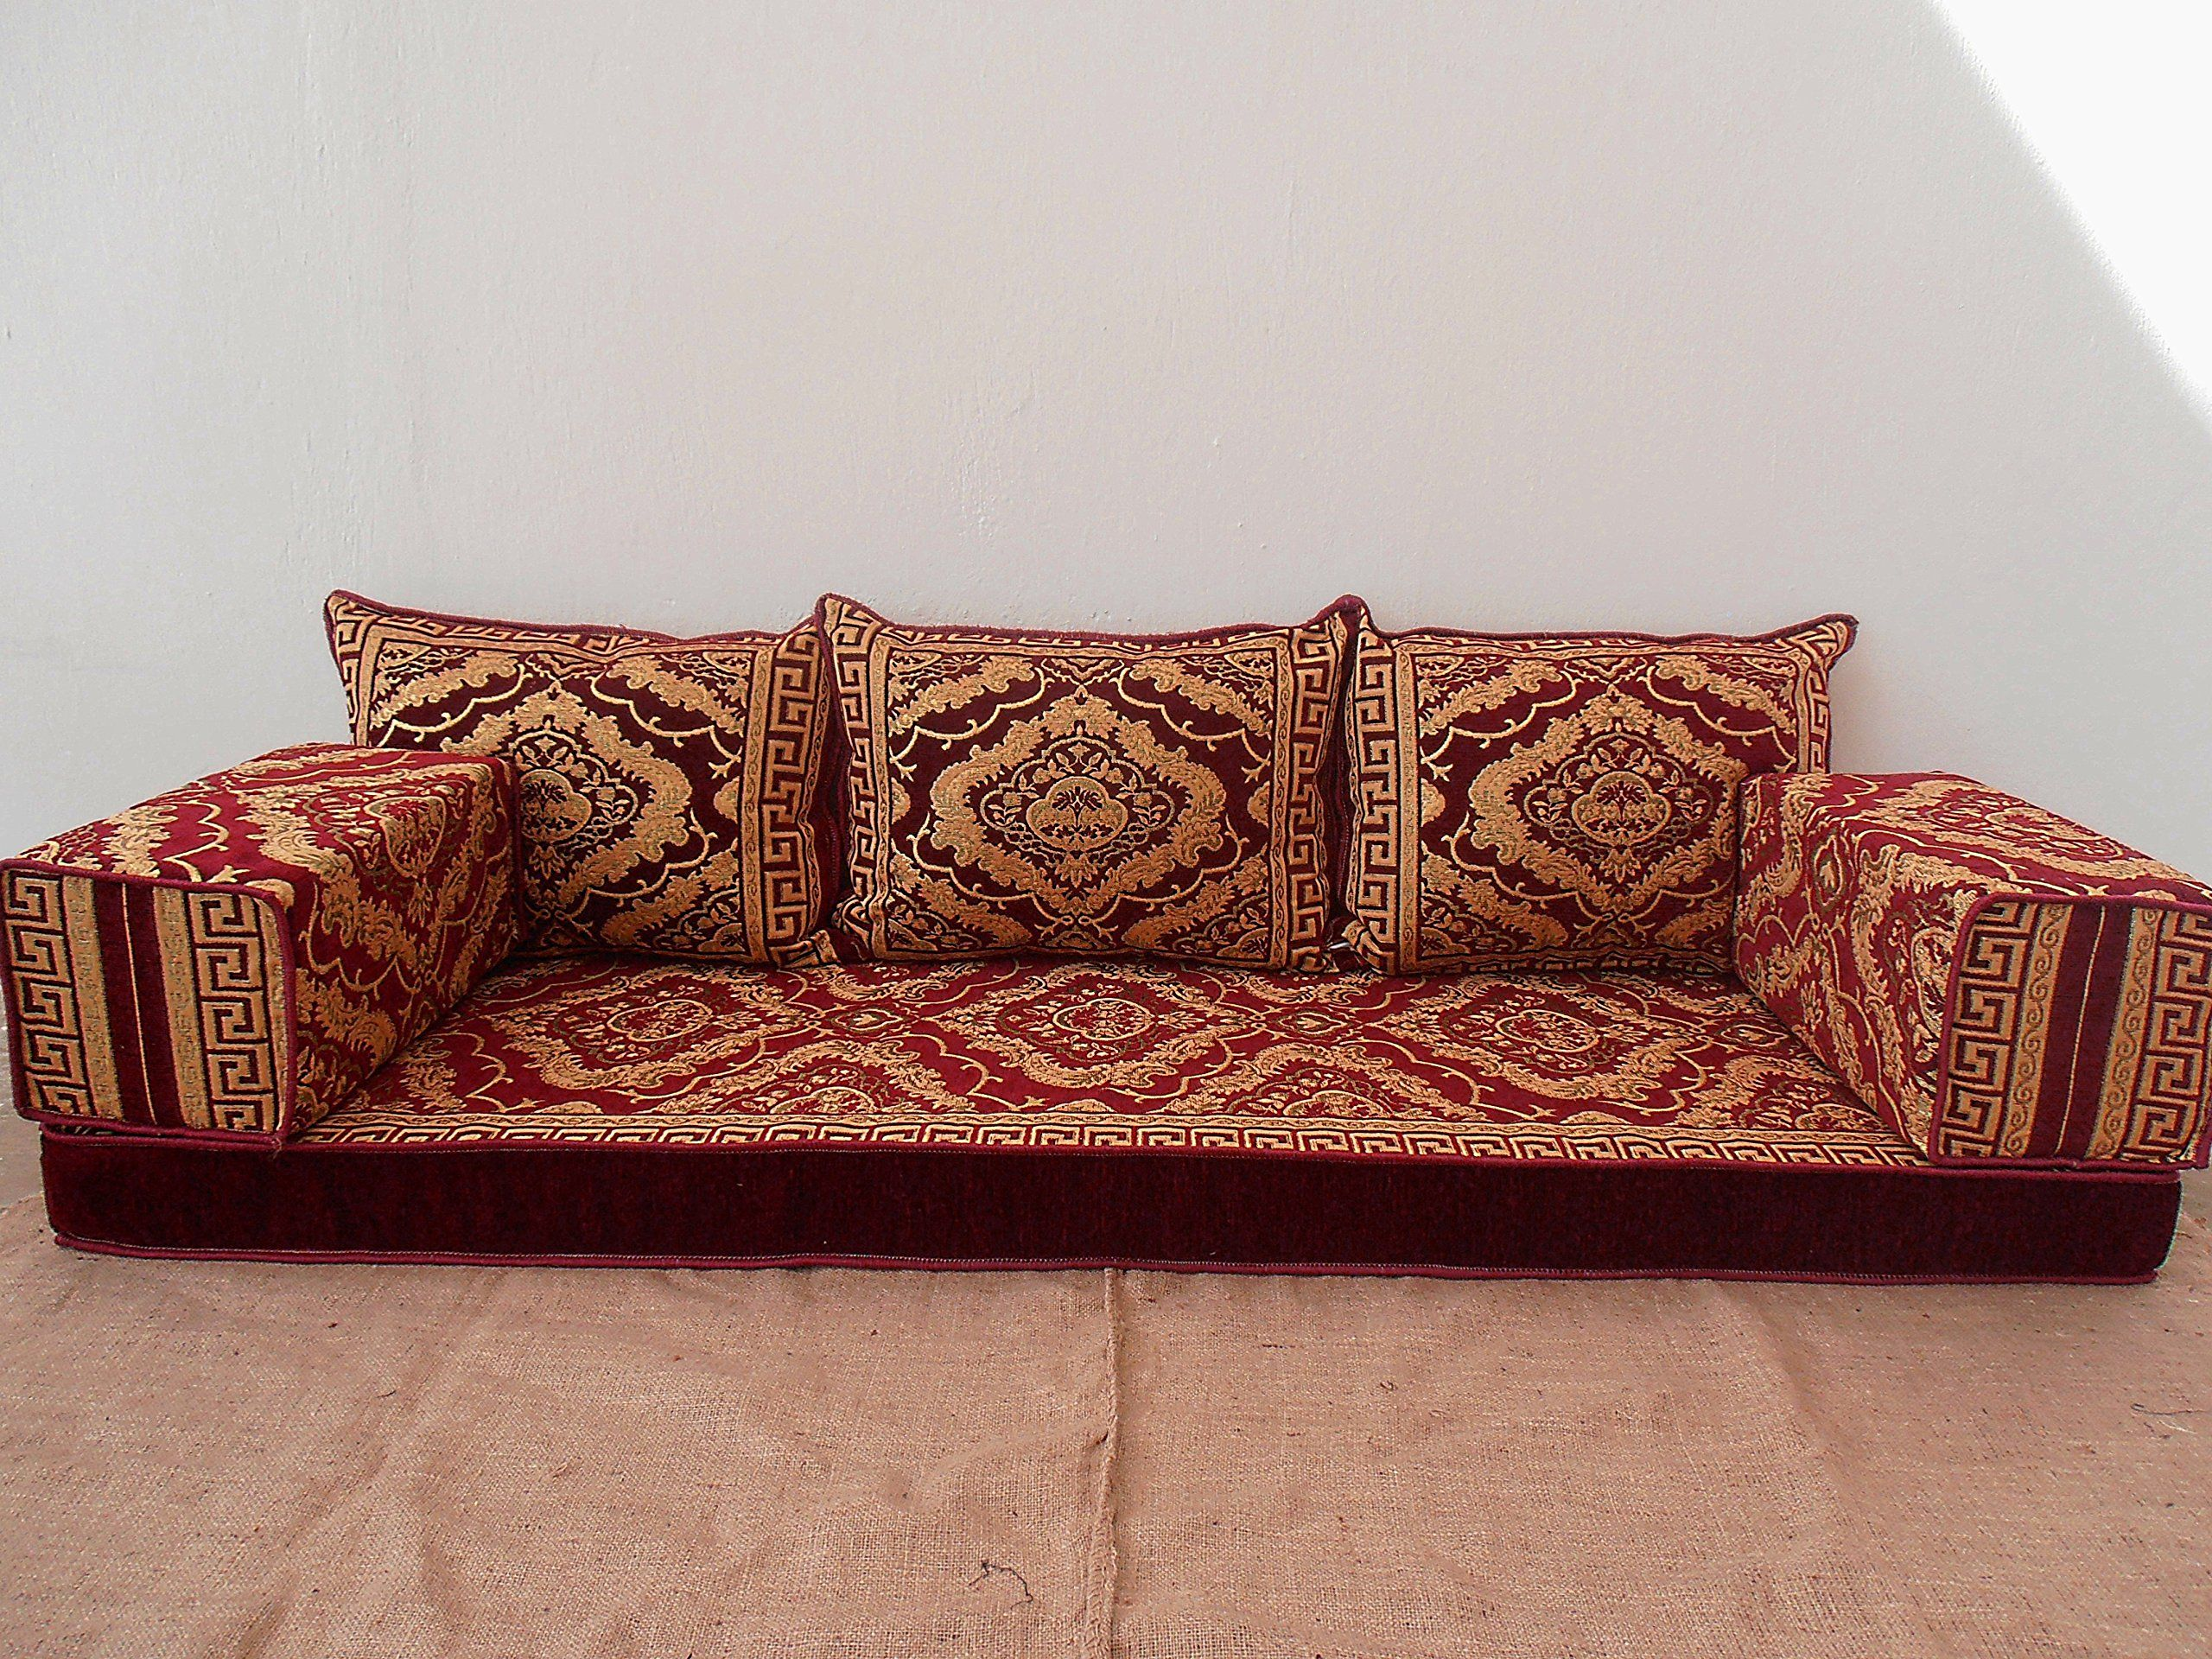 Arabic Floor Seating Arabic Sofa Arabic Couch Floor Seating Sofa Oriental Seating Hookah Bar Decor Arabic Furniture Sofa Handmade Bohemian Furniture Sofa Set